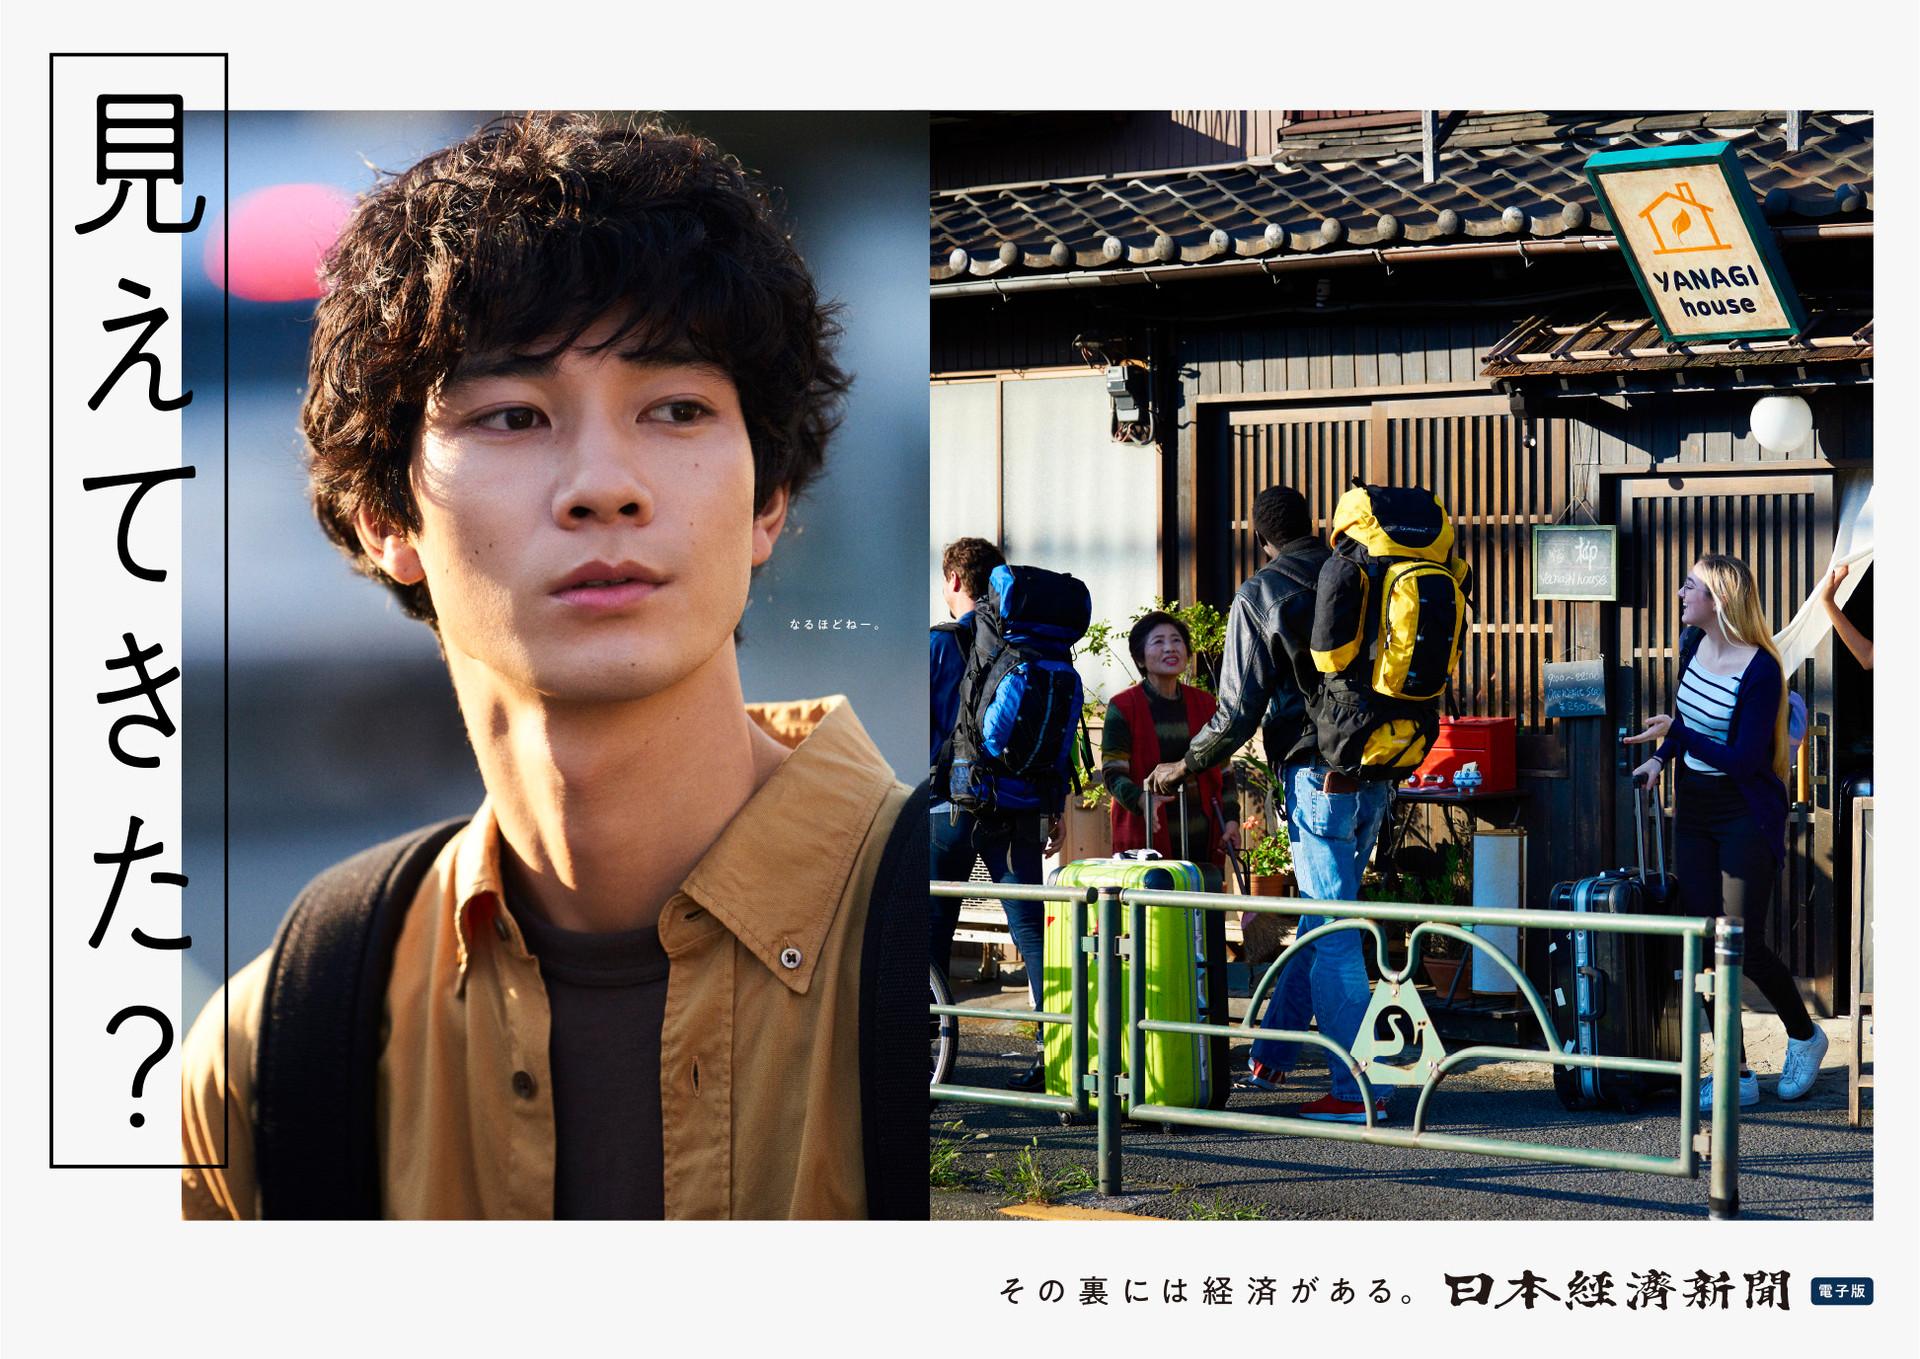 web_2019_nikkei_works_01.jpg